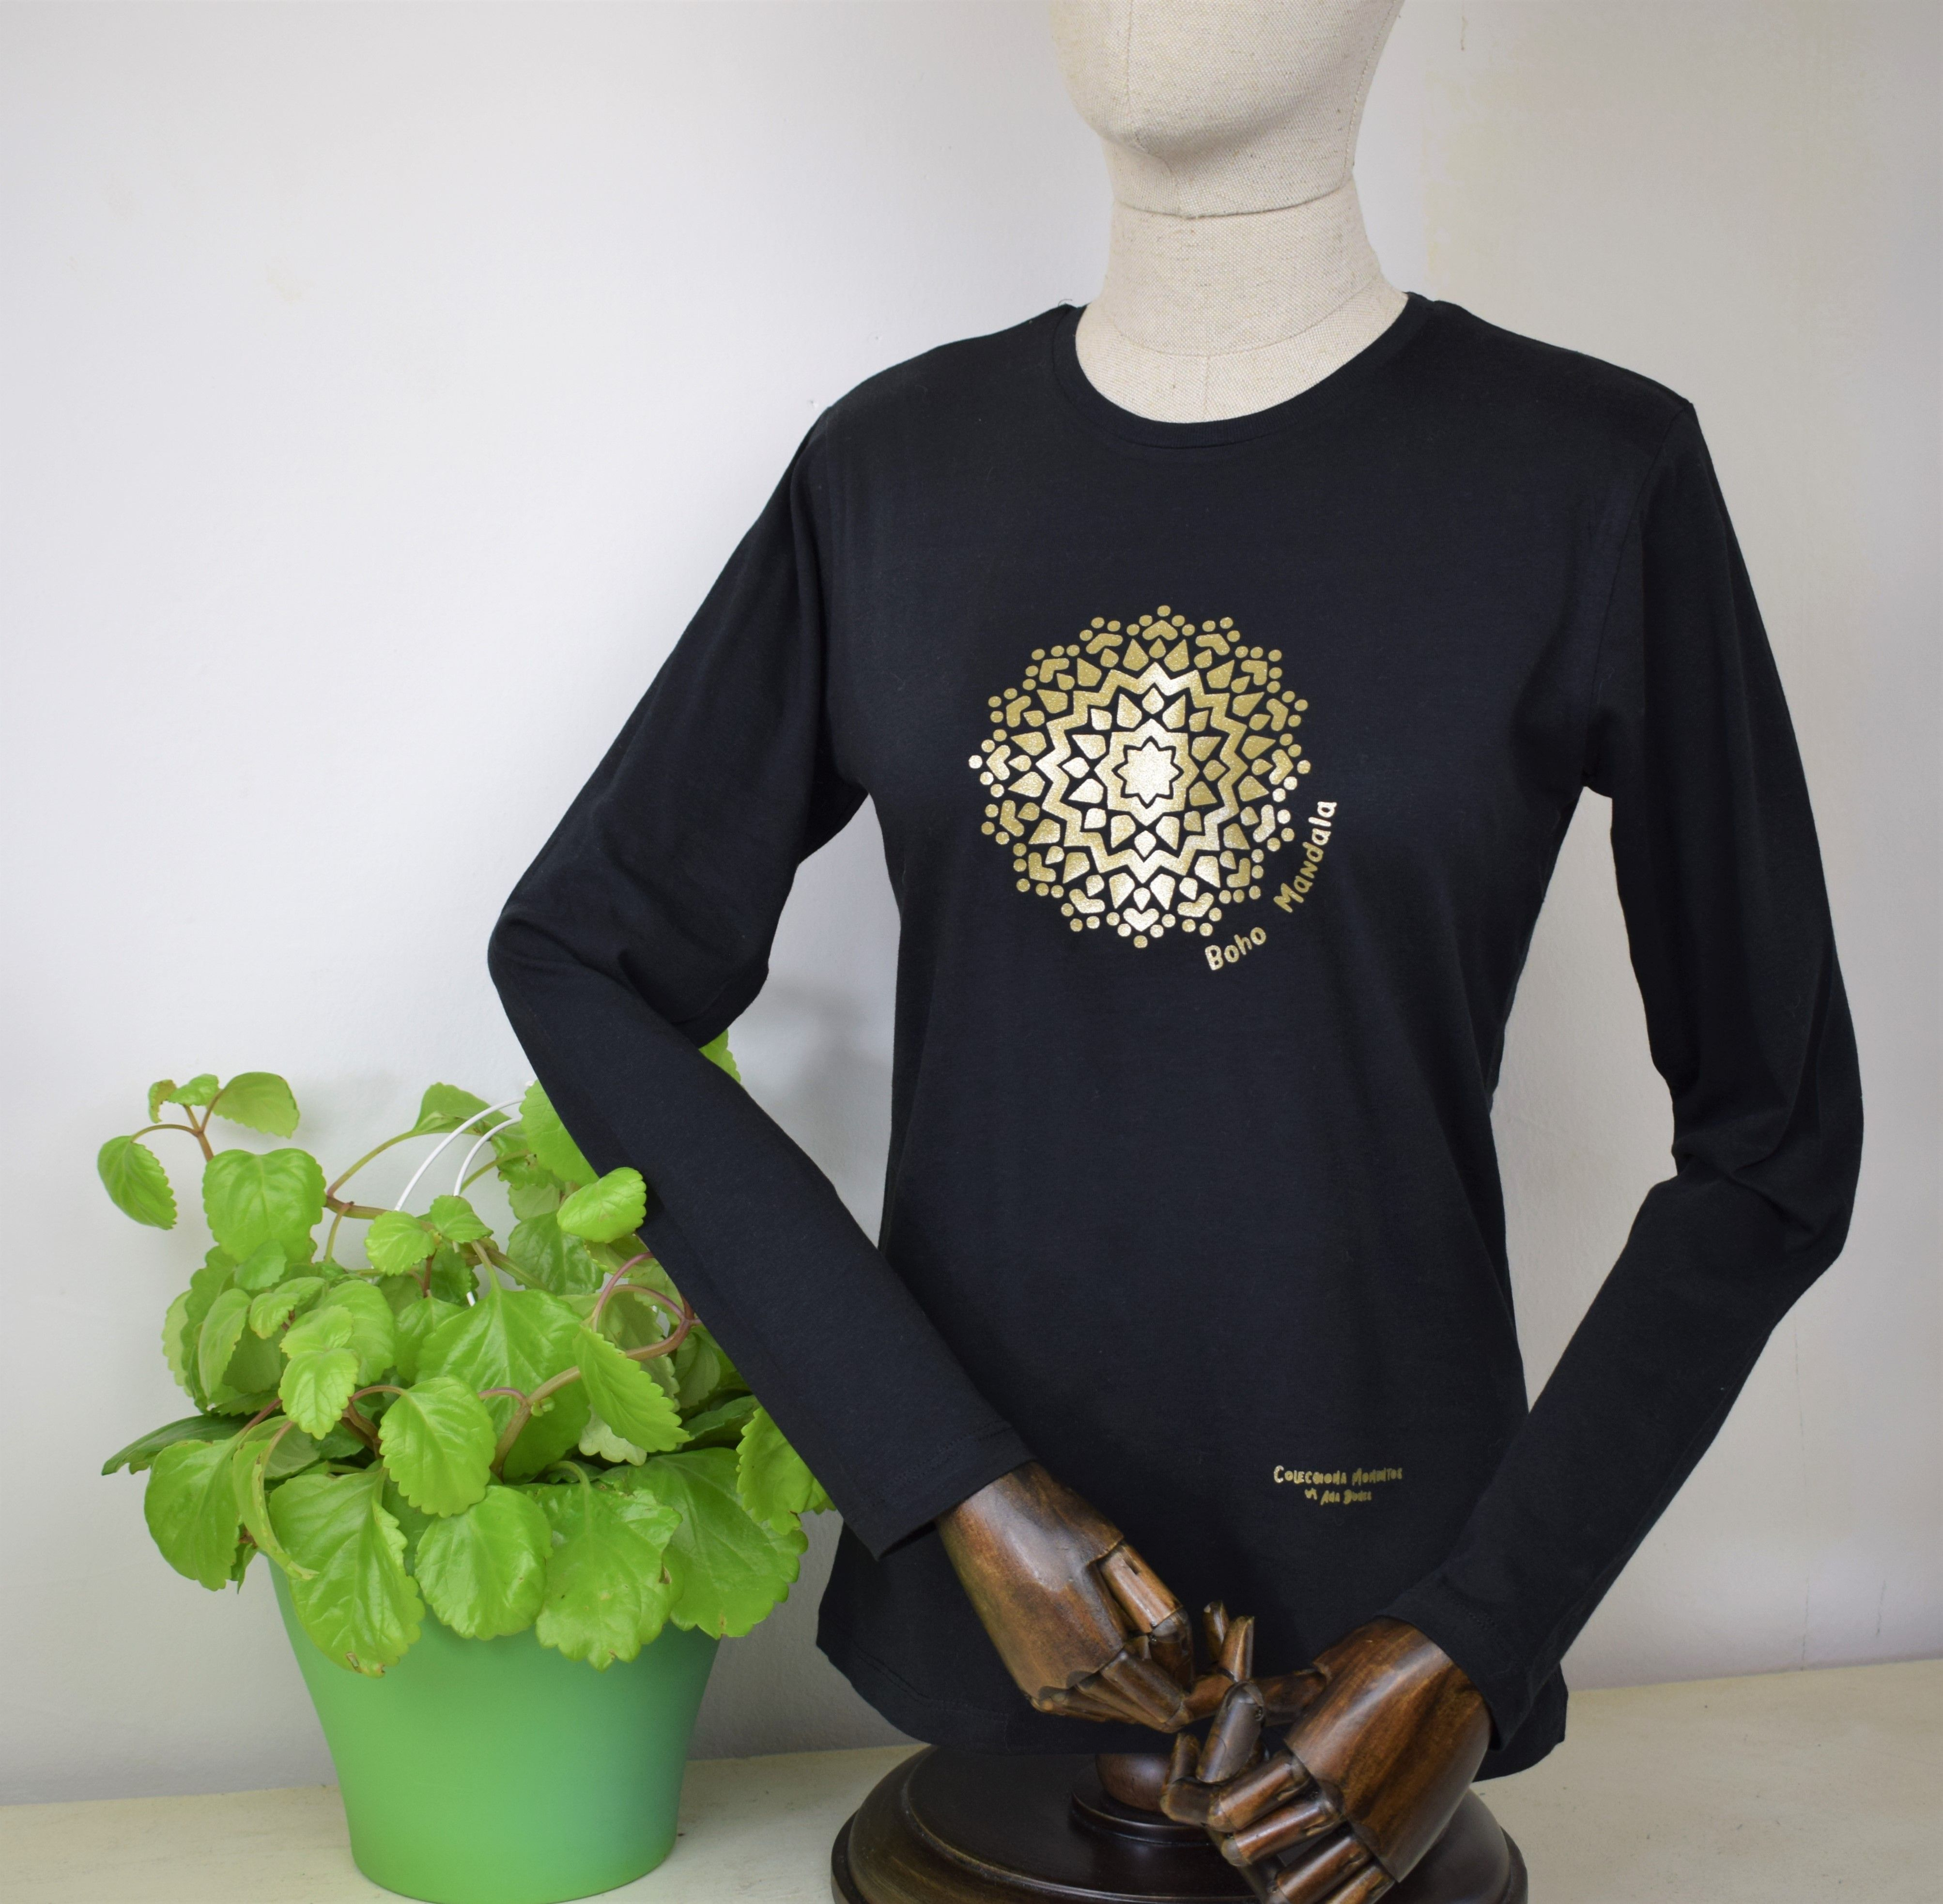 Camiseta manga larga con mandala dorado. Camisetas originales. Colecciona  momentos by Ana Dones 37feb37c64845